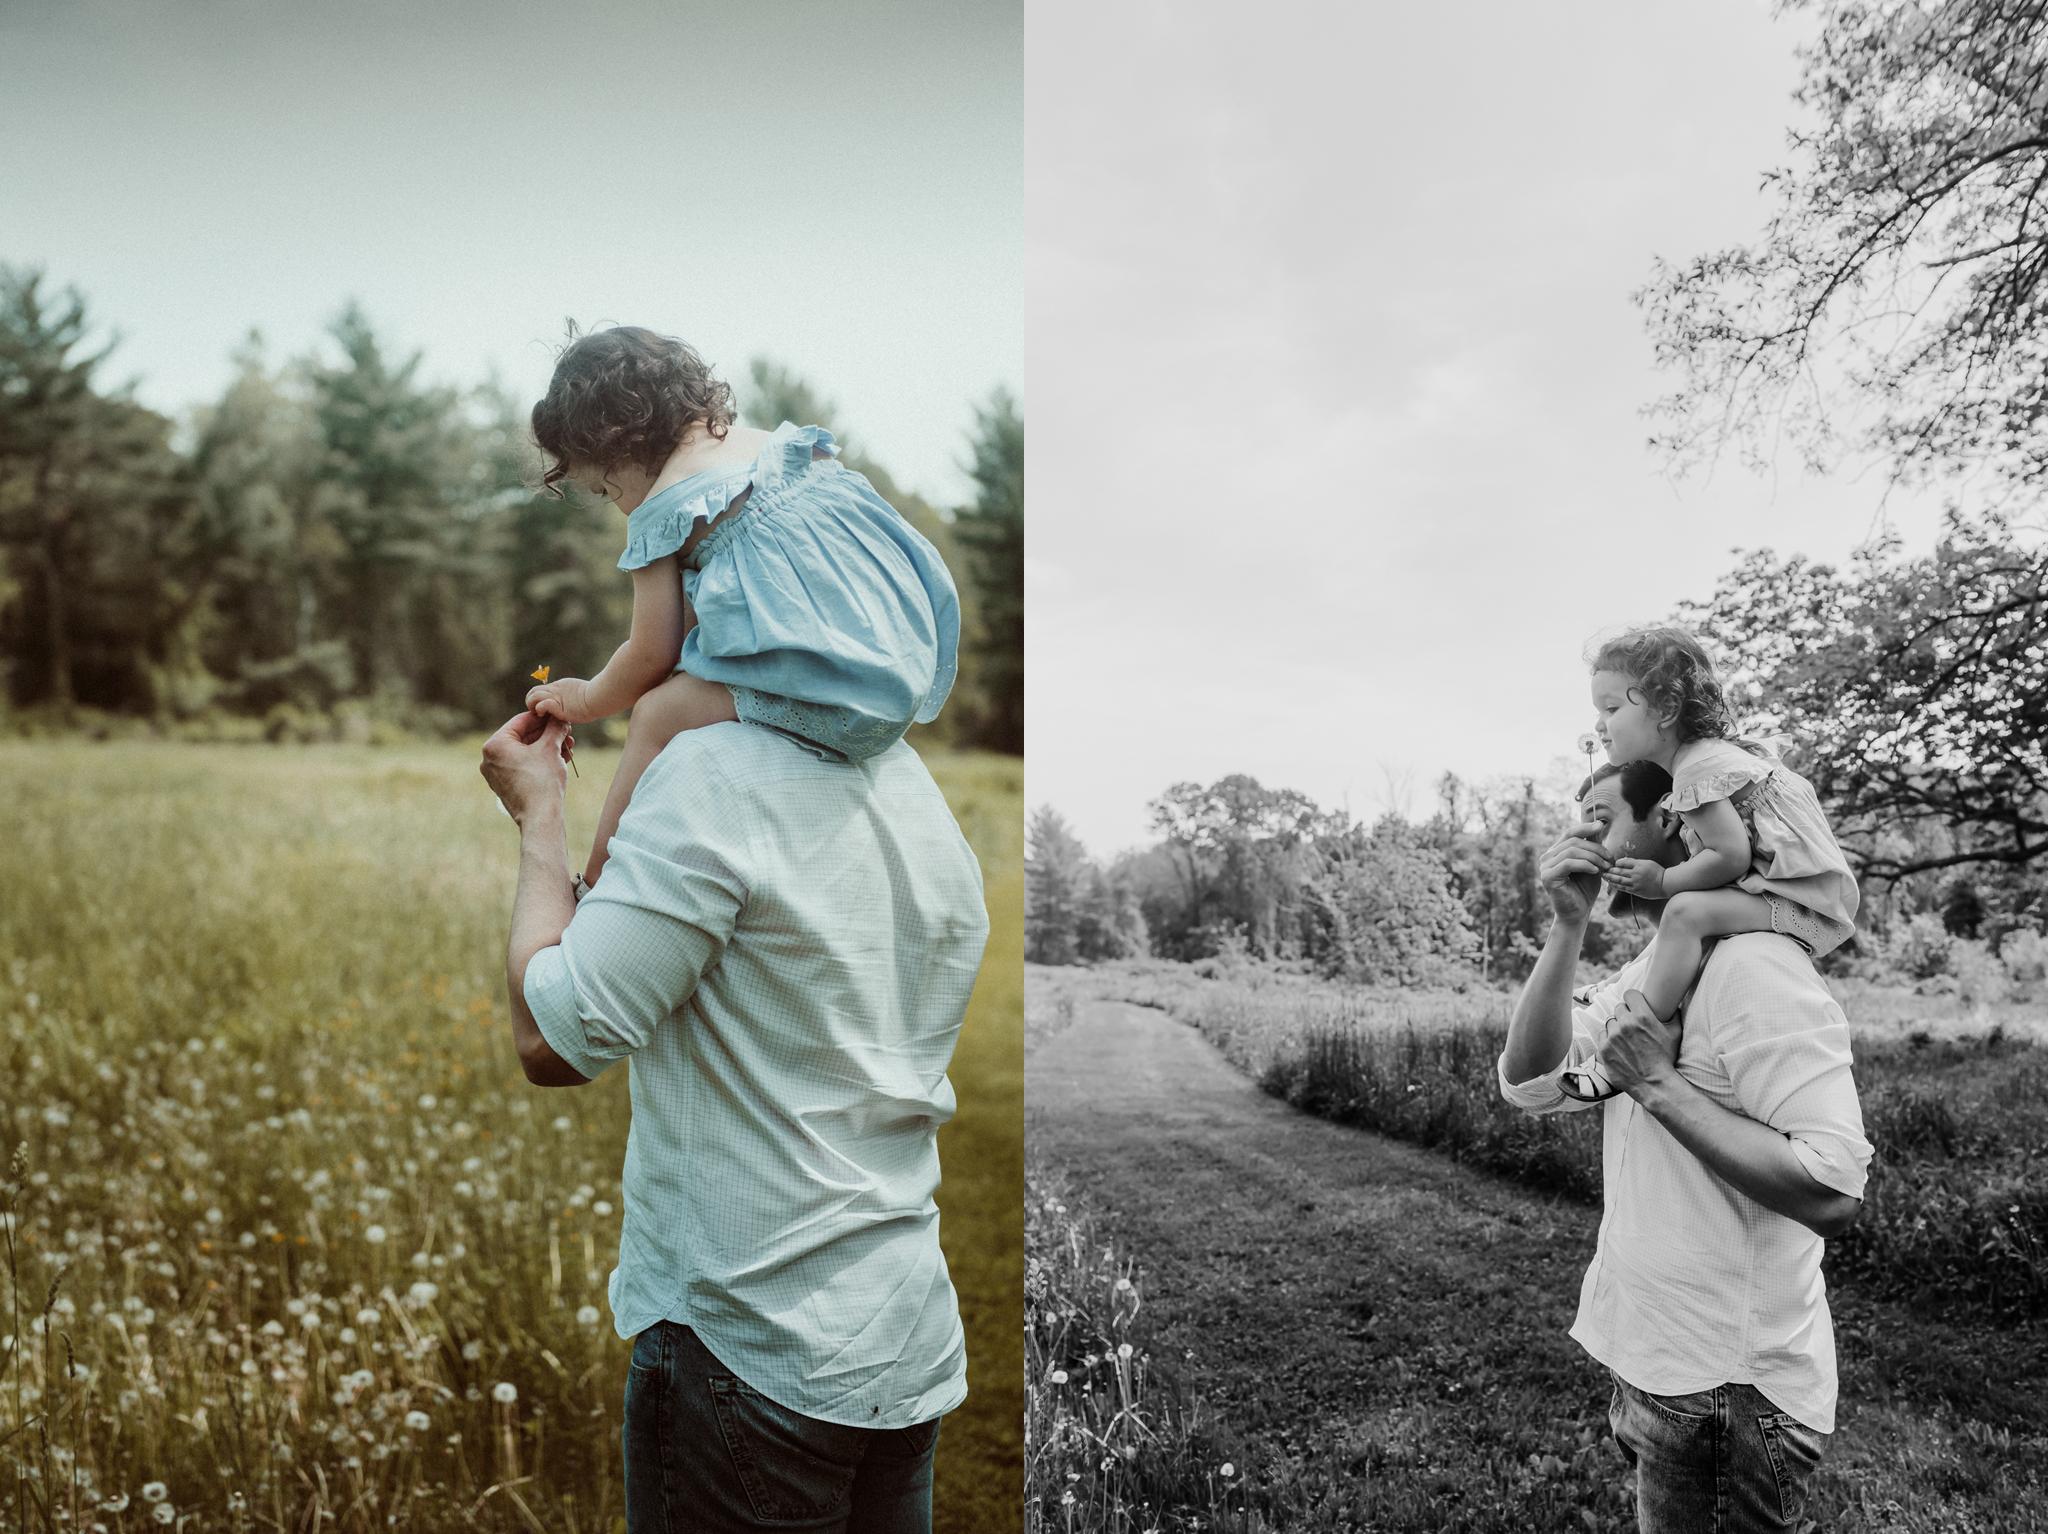 amy-drucker-lifestyle-family-photography-9.jpg